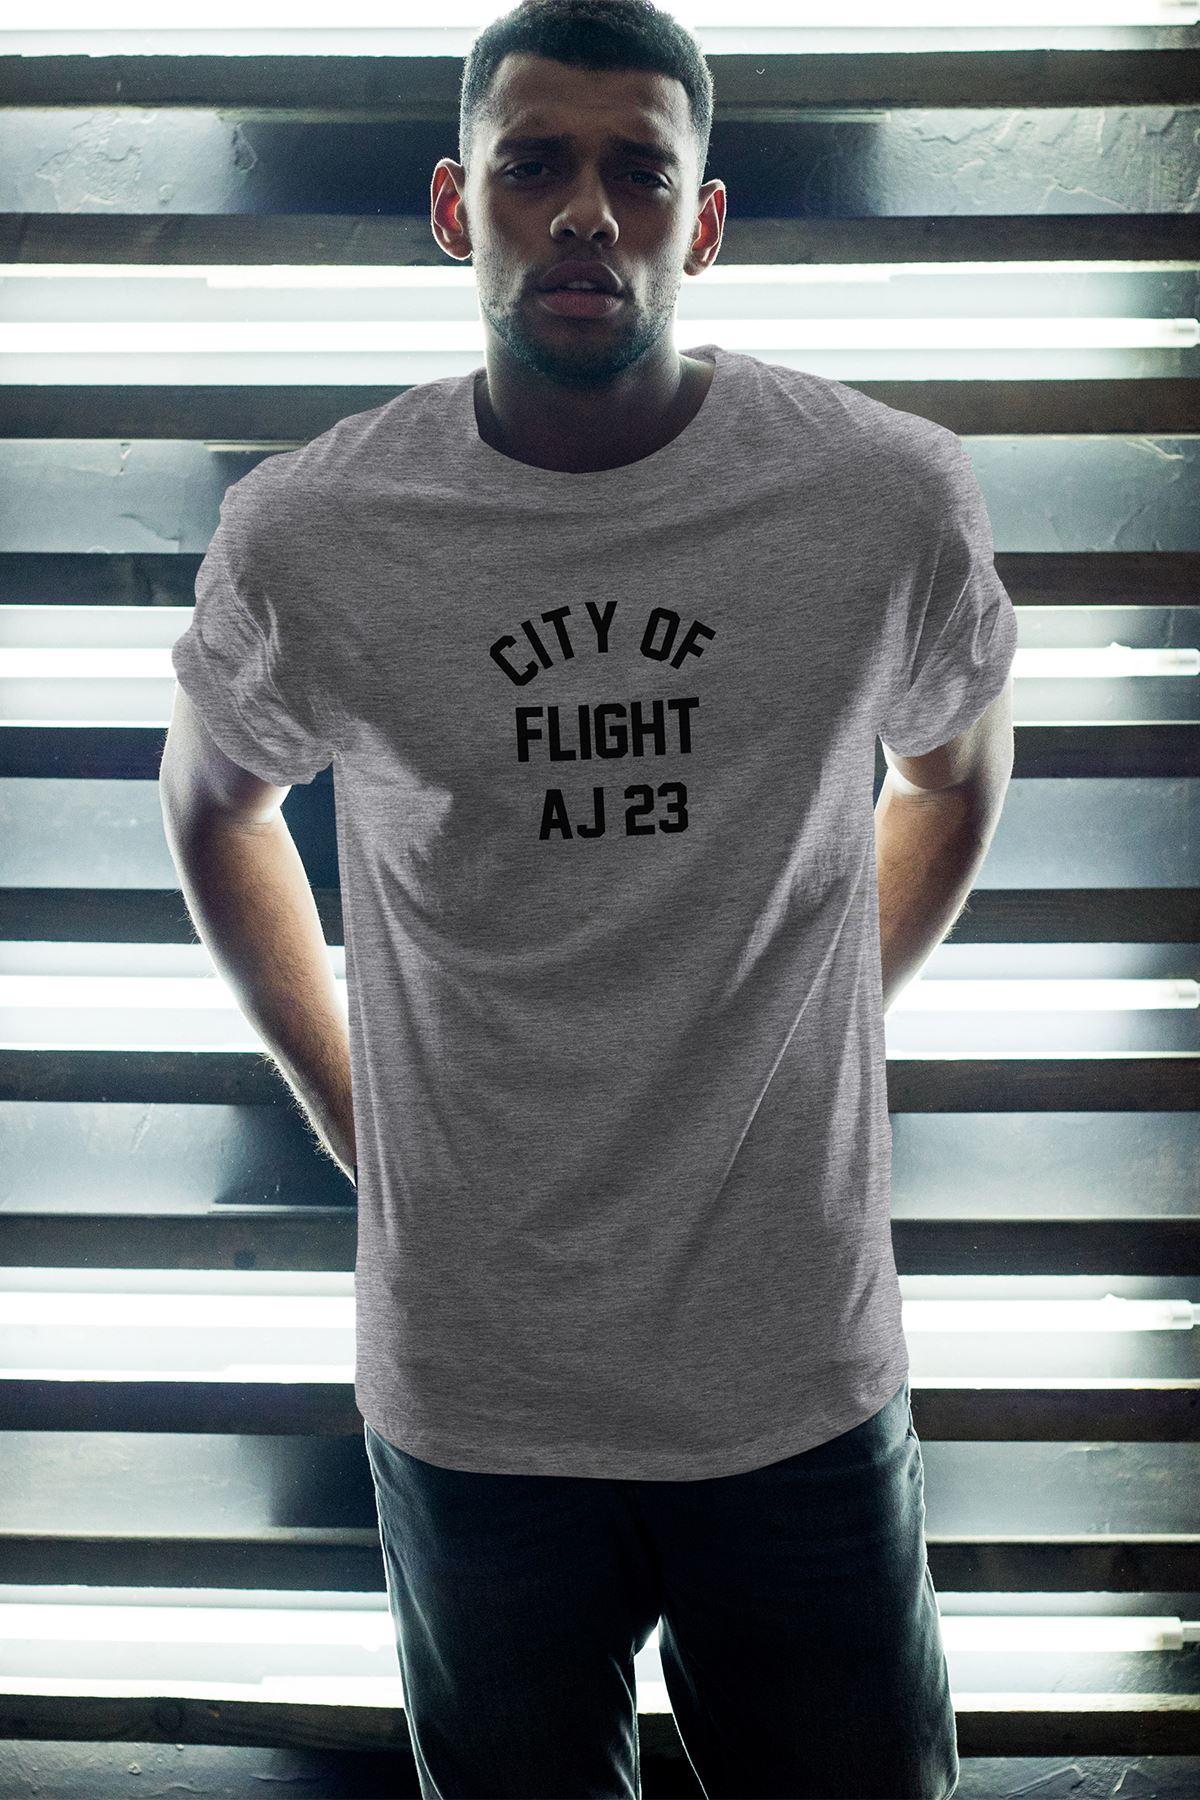 City Of Flight Gri Erkek Oversize Tshirt - Tişört